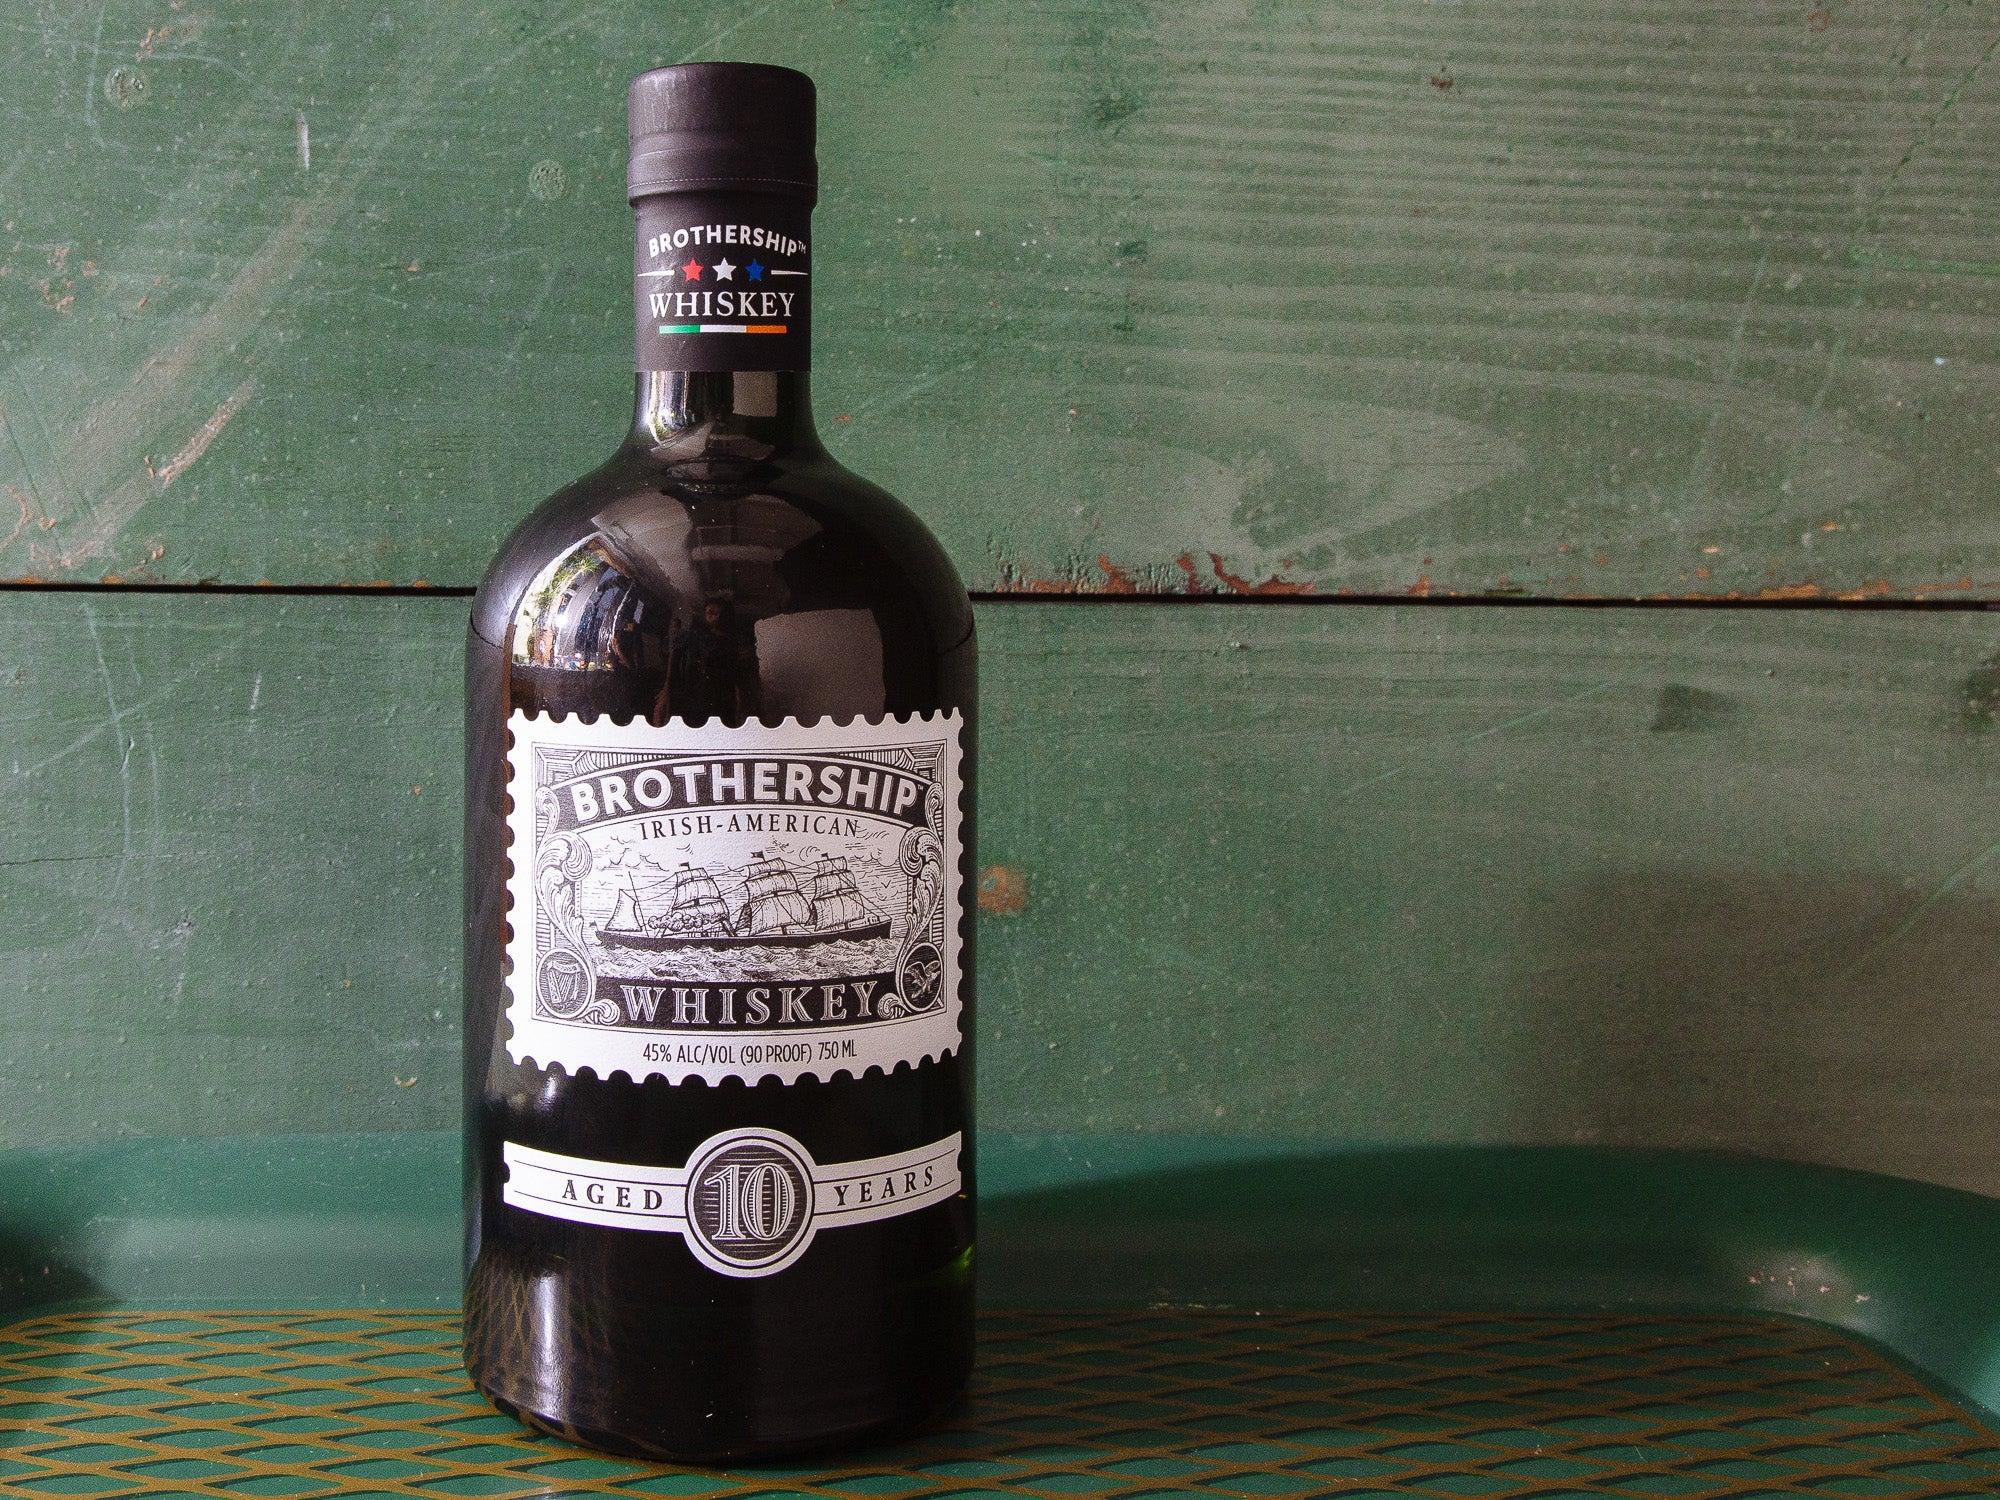 Brothership Irish-American Whiskey